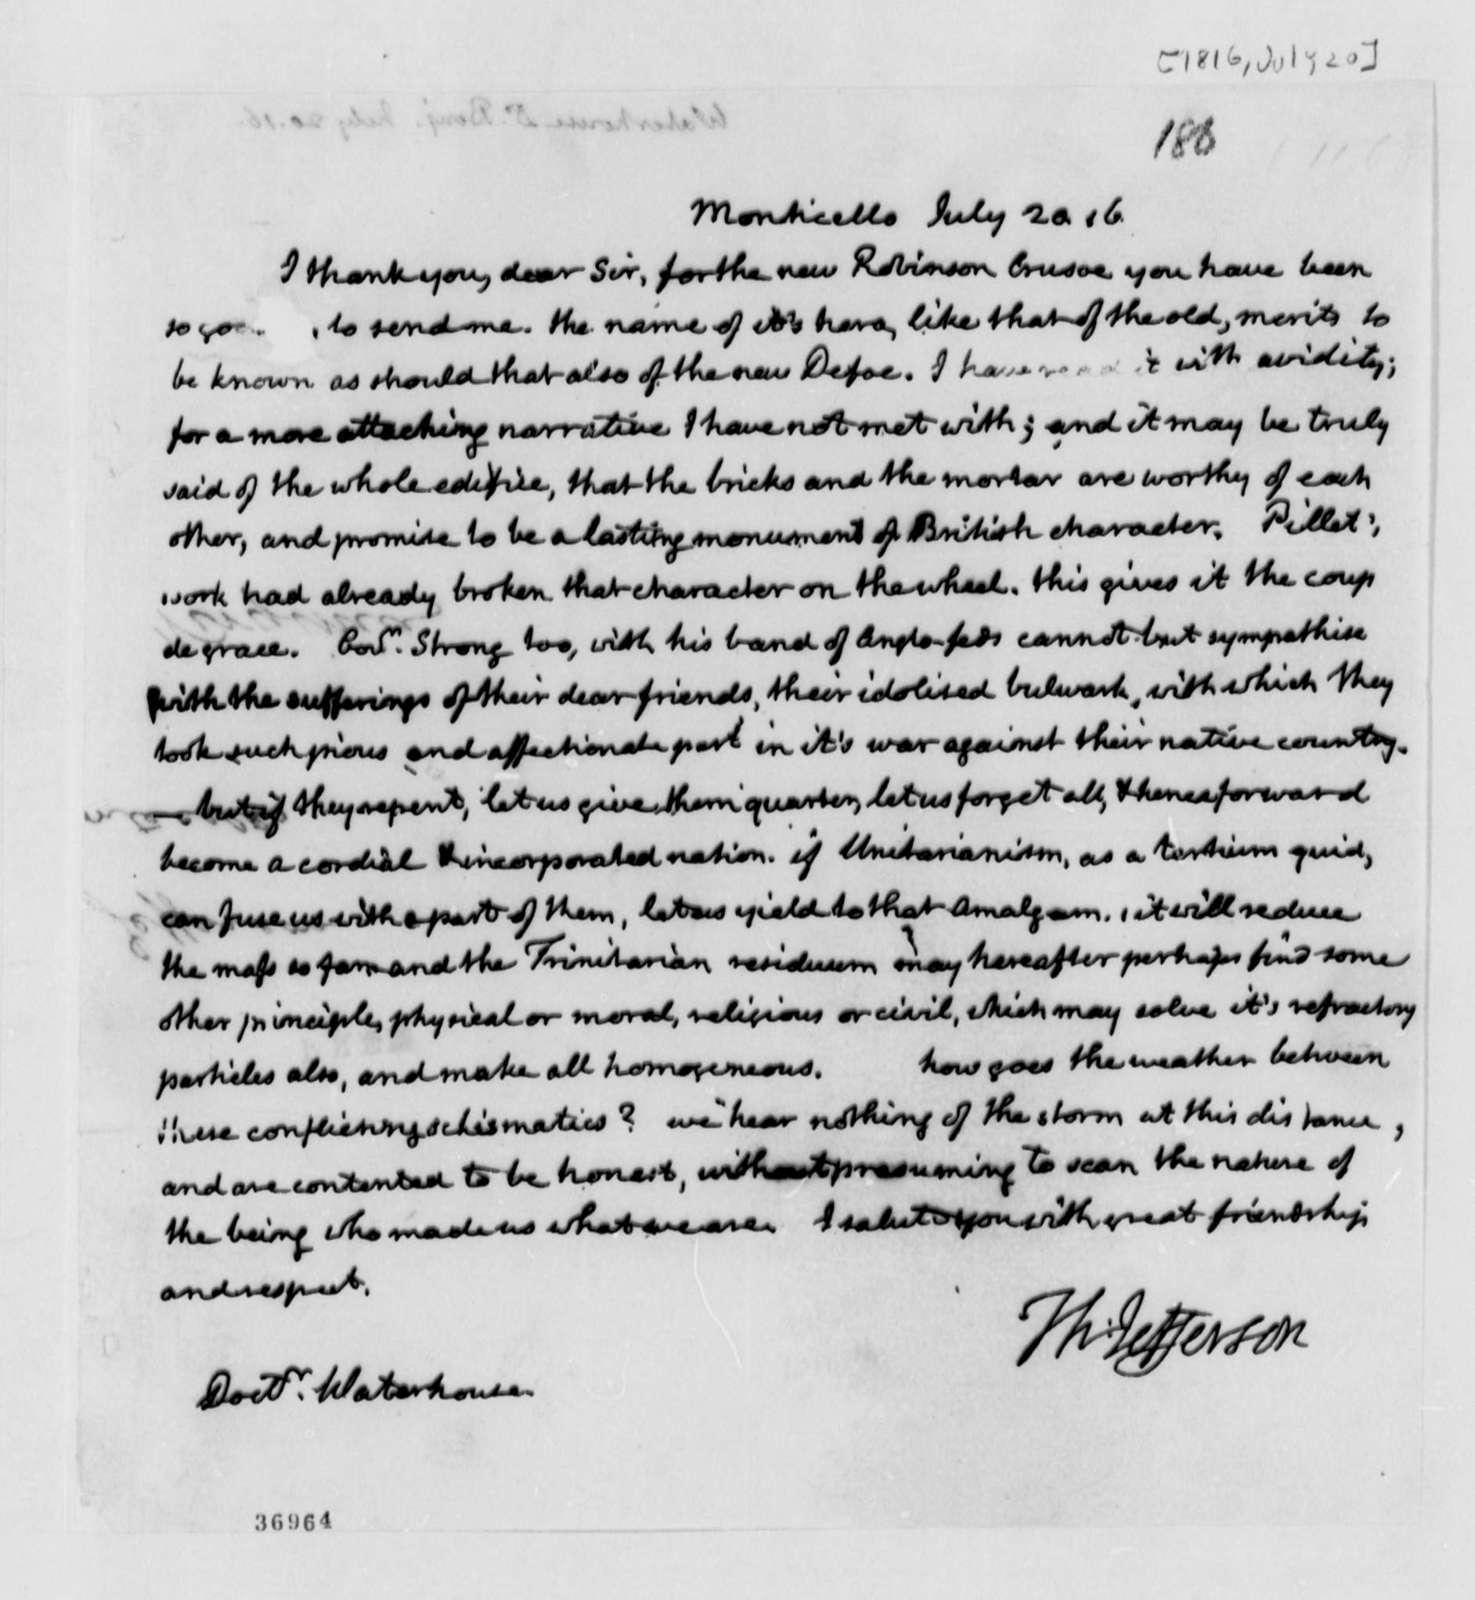 William Waterhouse to Thomas Jefferson, July 20, 1816